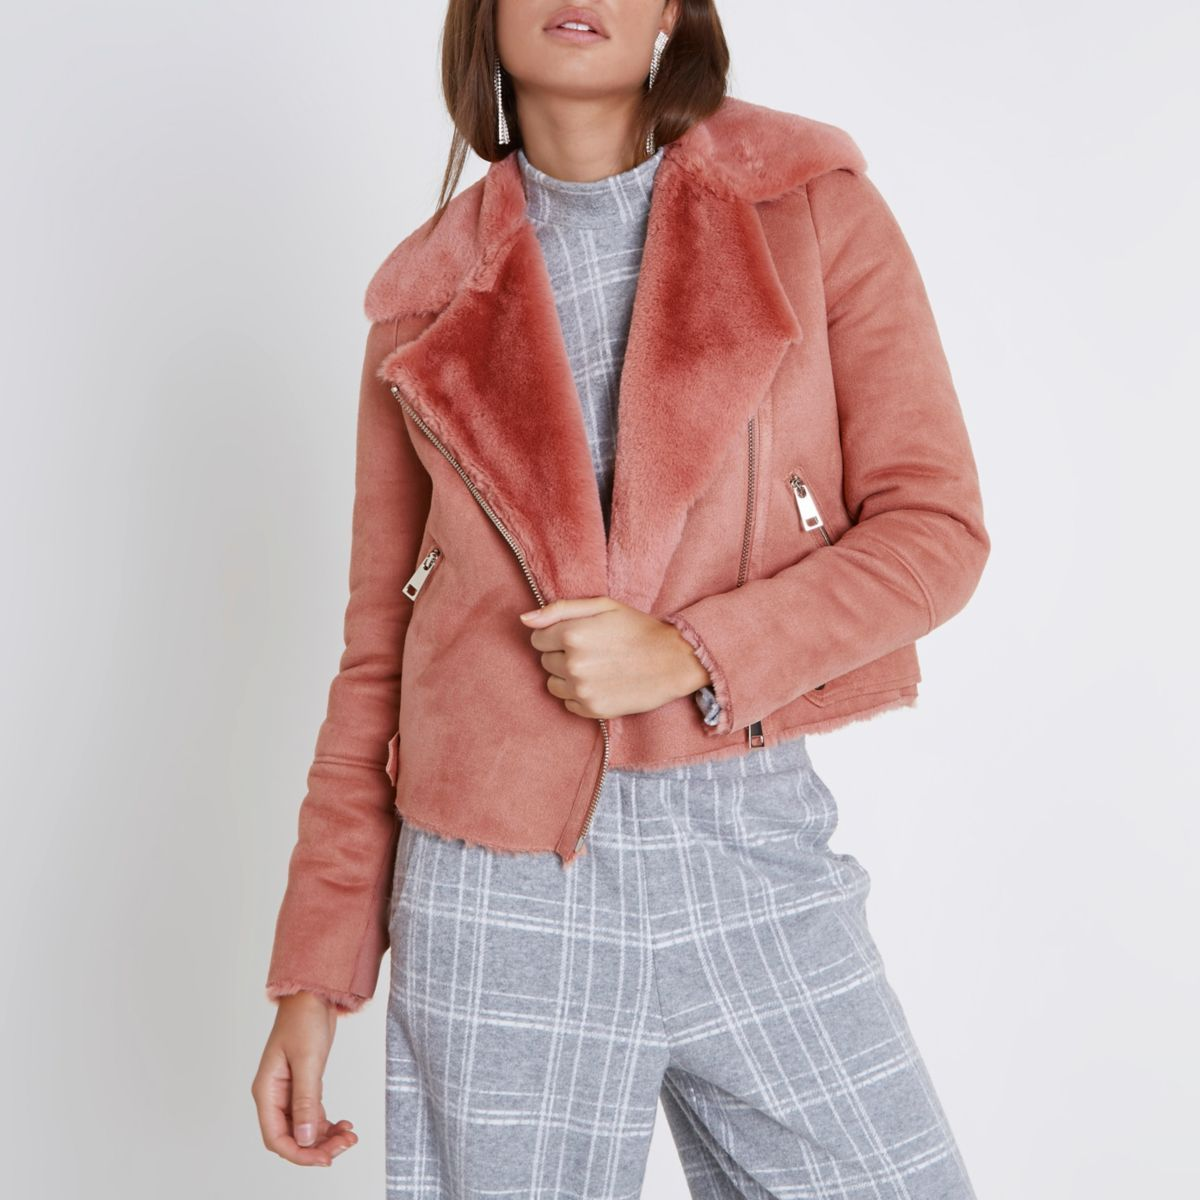 af2d5e5a Pink faux shearling biker jacket - Jackets - Coats & Jackets - women ...